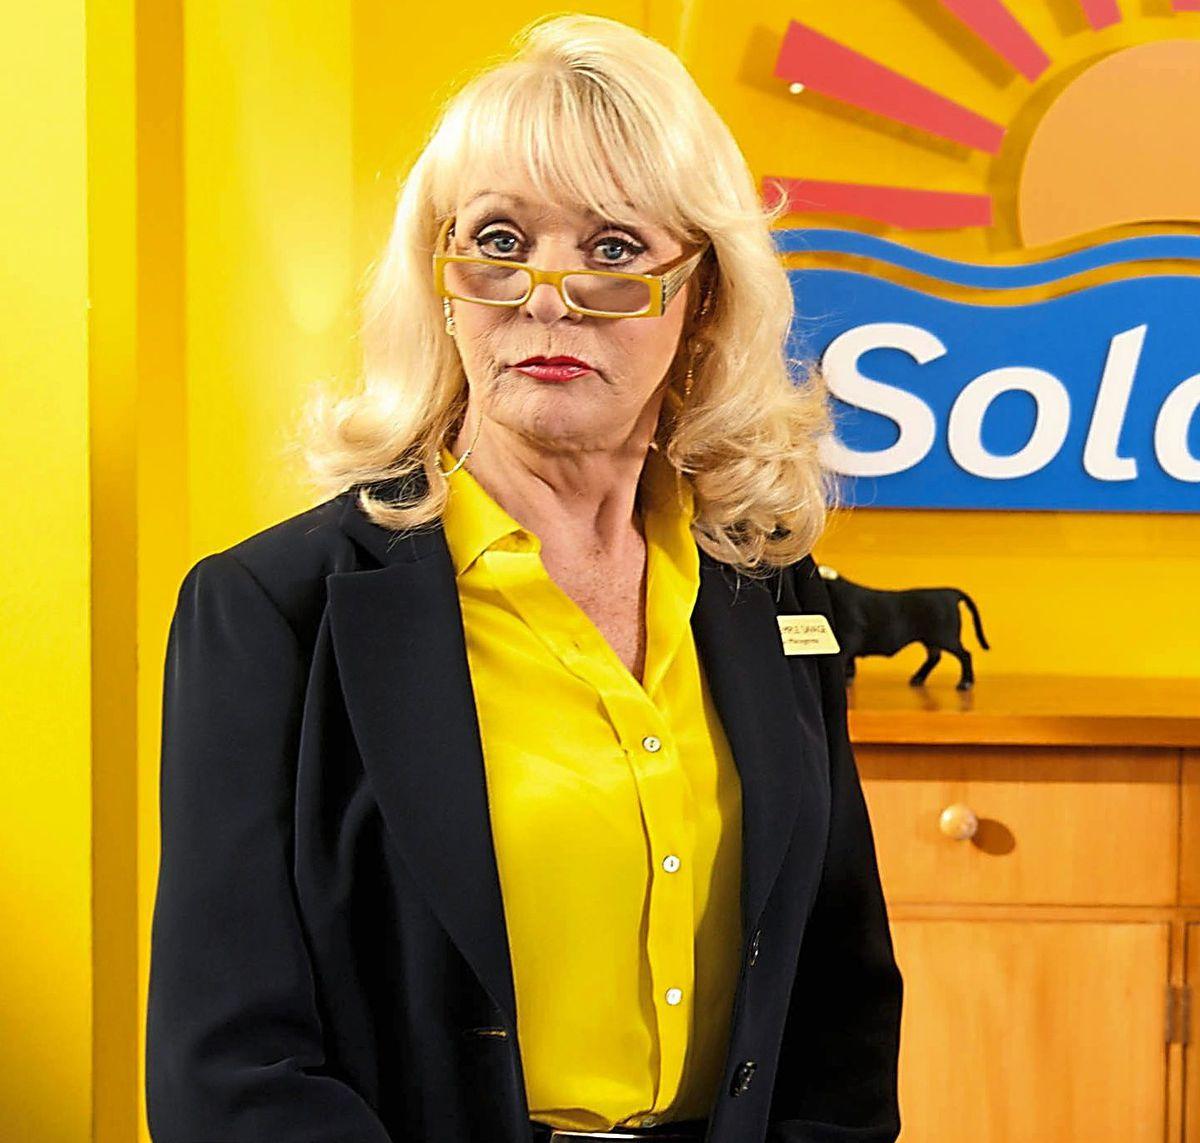 Sherrie Hewson as Solana Hotel manager Joyce